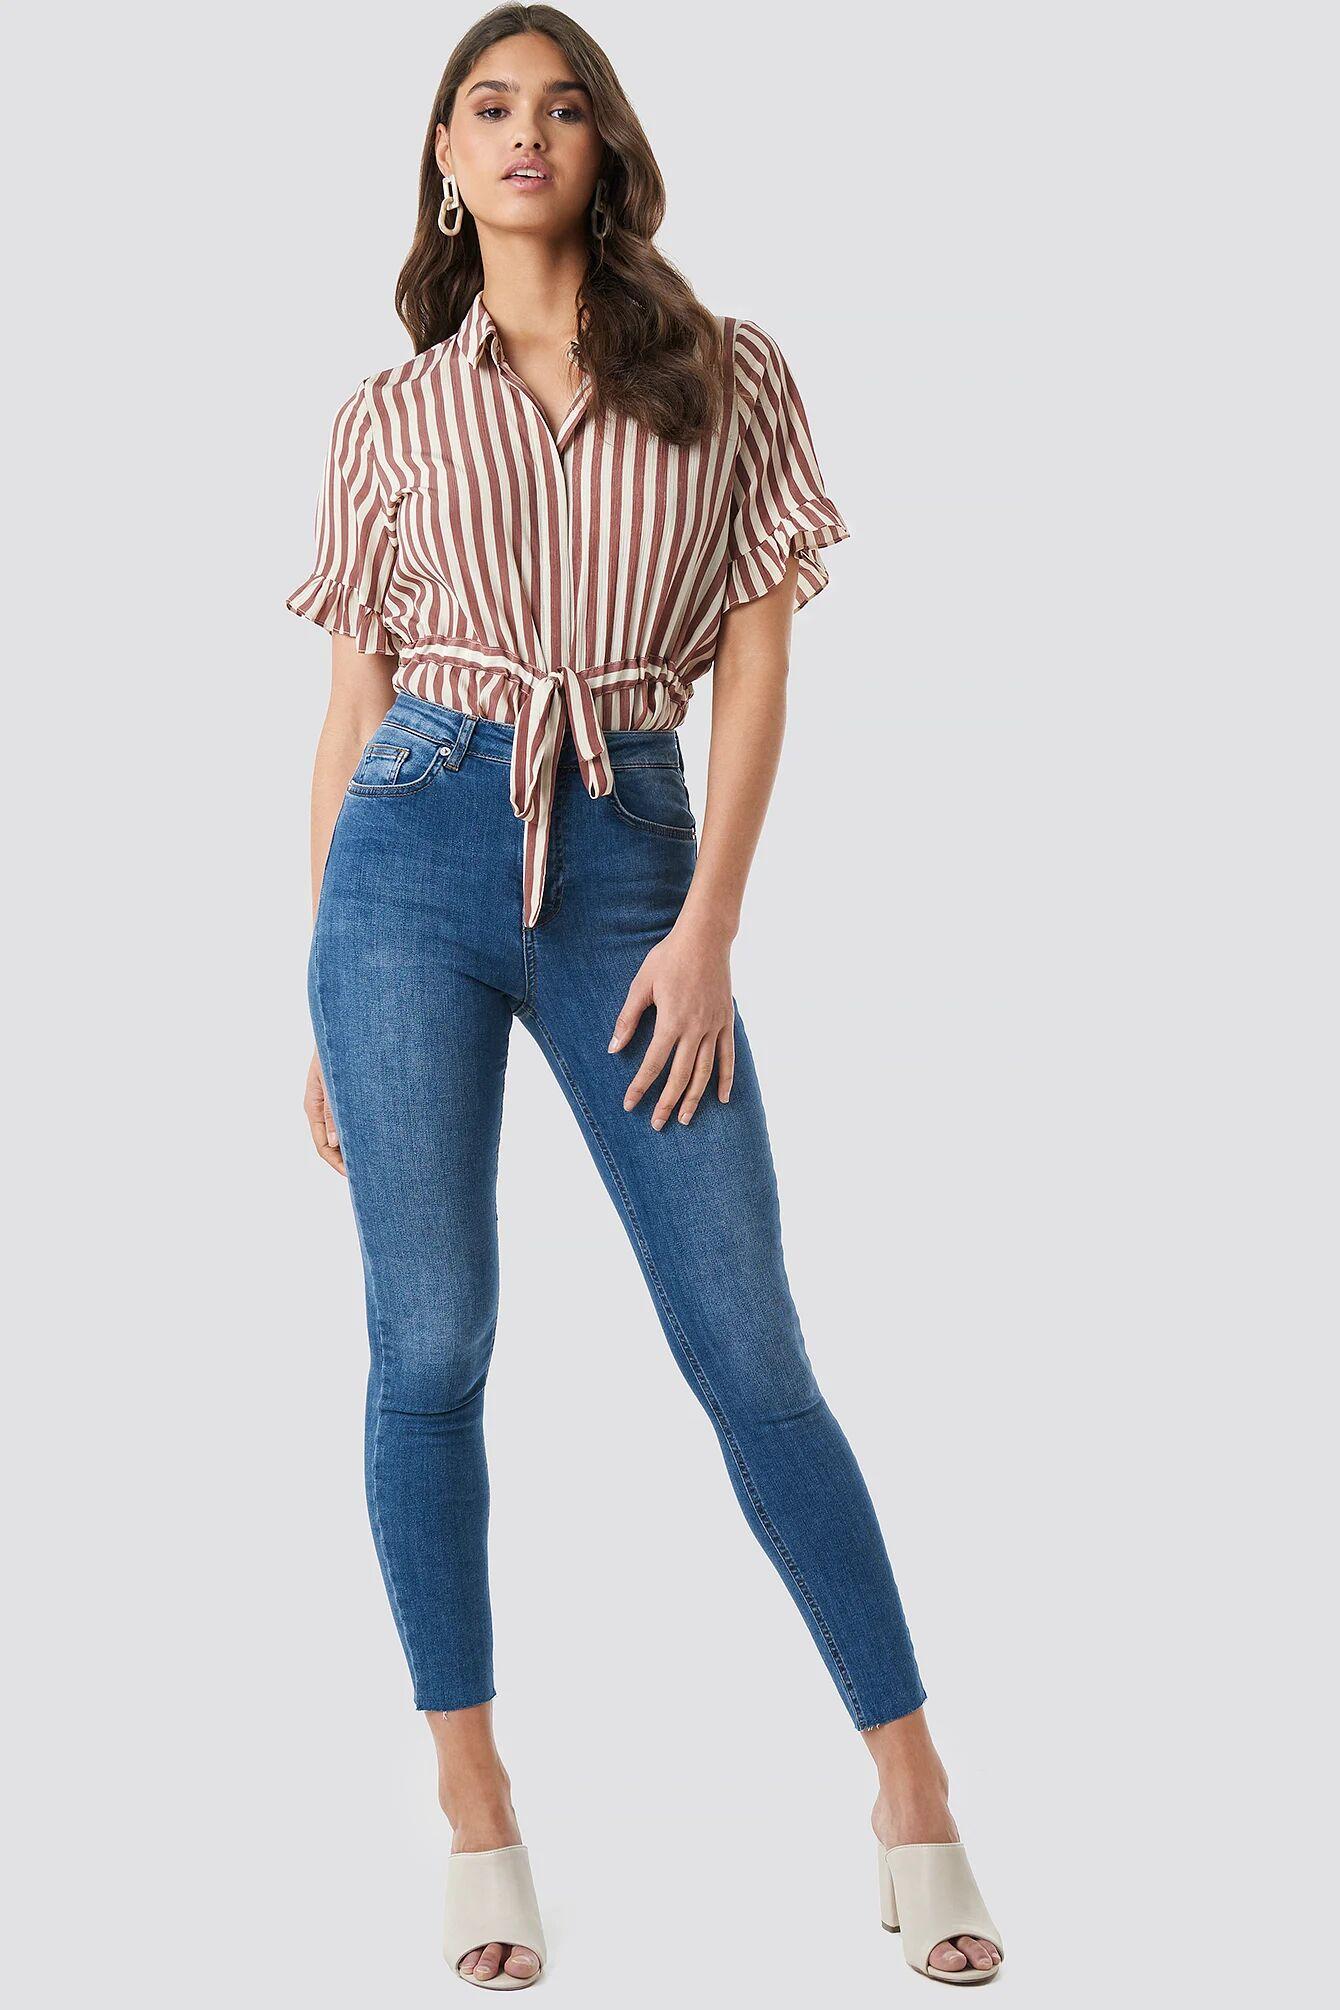 NA-KD Skinny High Waist Raw Hem Jeans - Blue